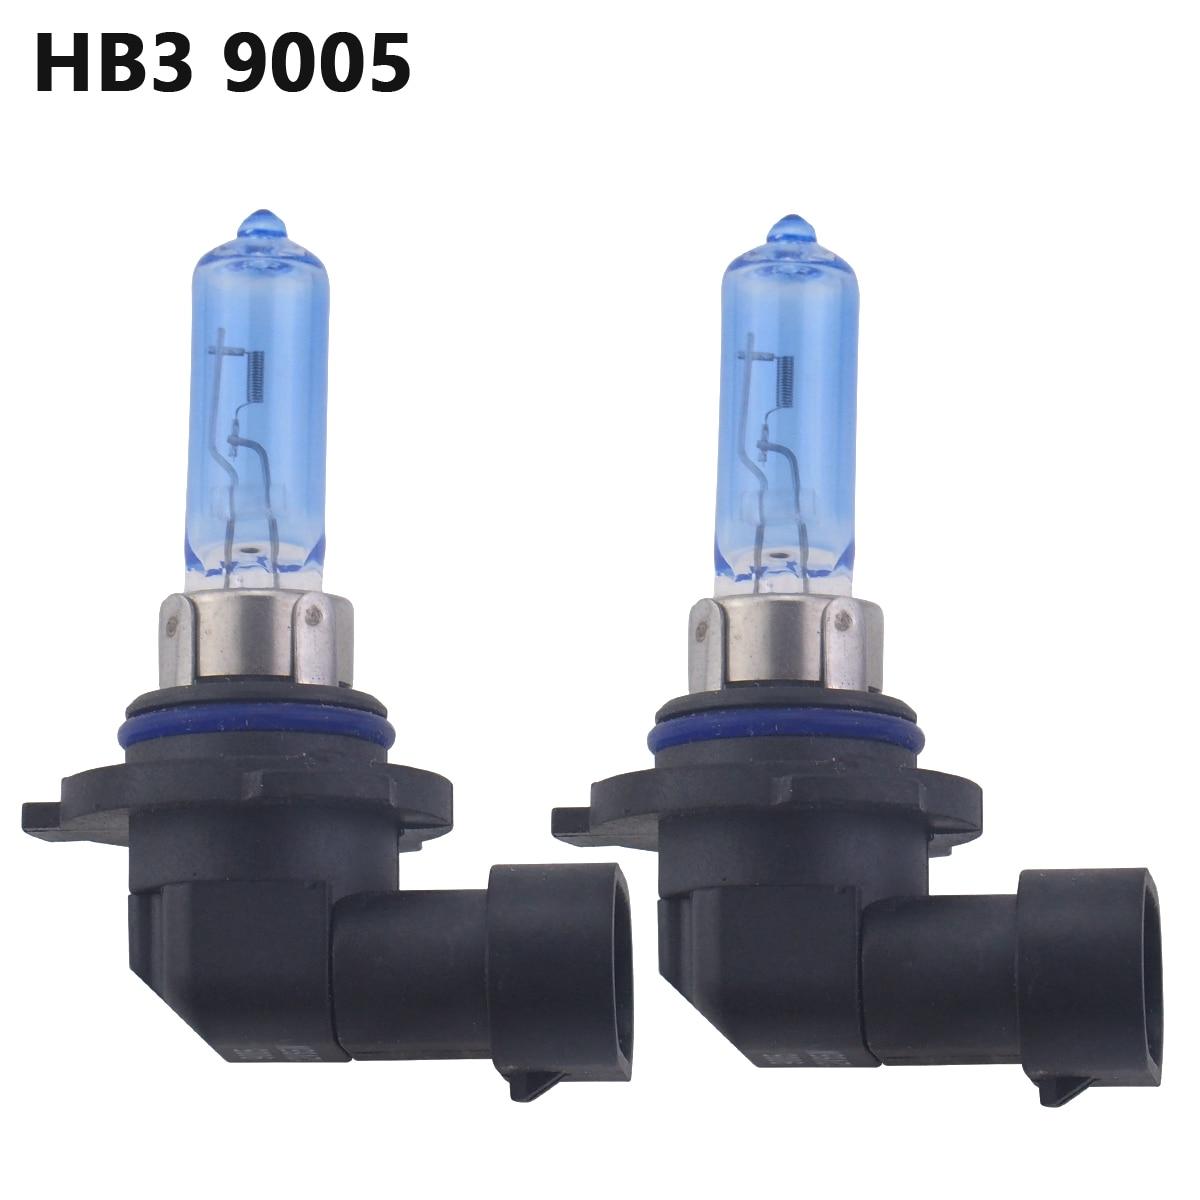 2pcs 12V 100w H3 White 5000K Xenon Gas HID Foglight Light Bulbs 1 Pair